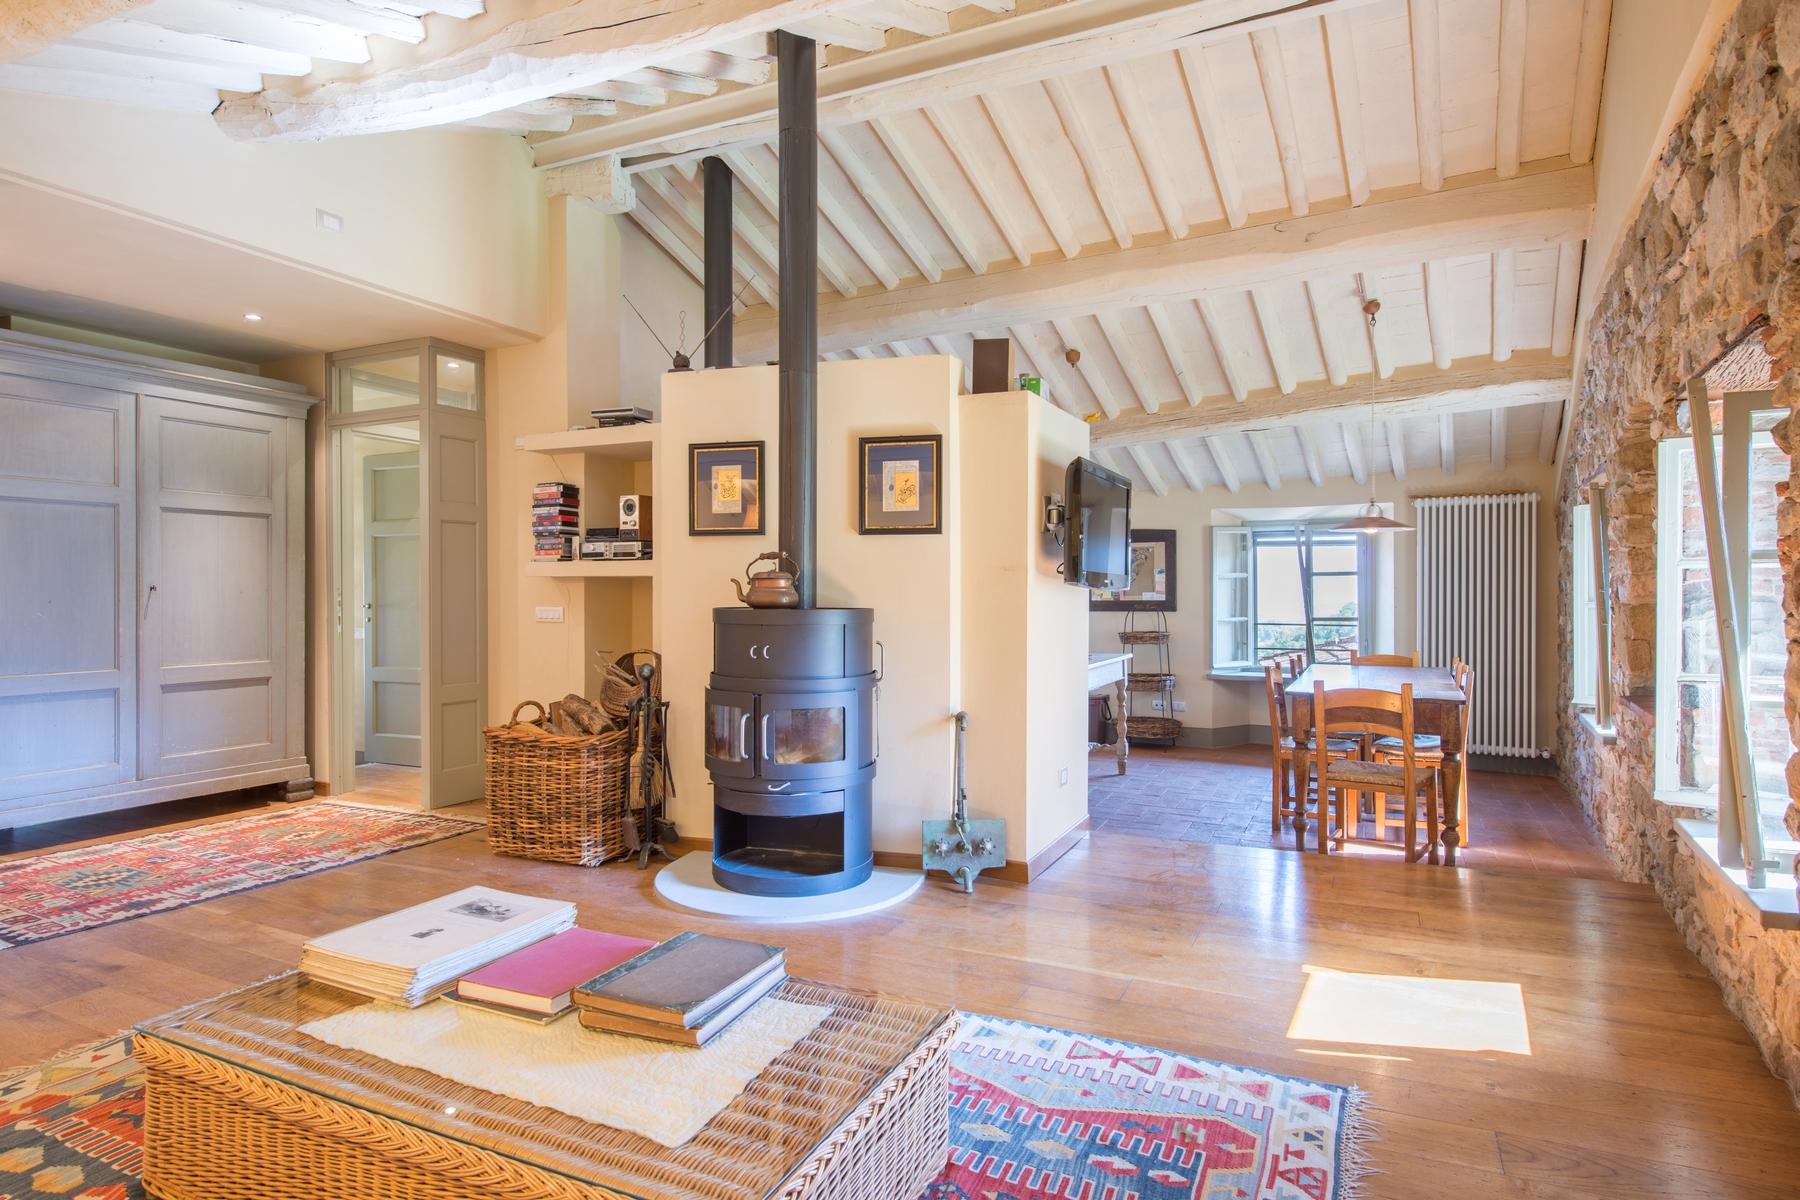 Villa in Vendita a Lucca: 5 locali, 2500 mq - Foto 10